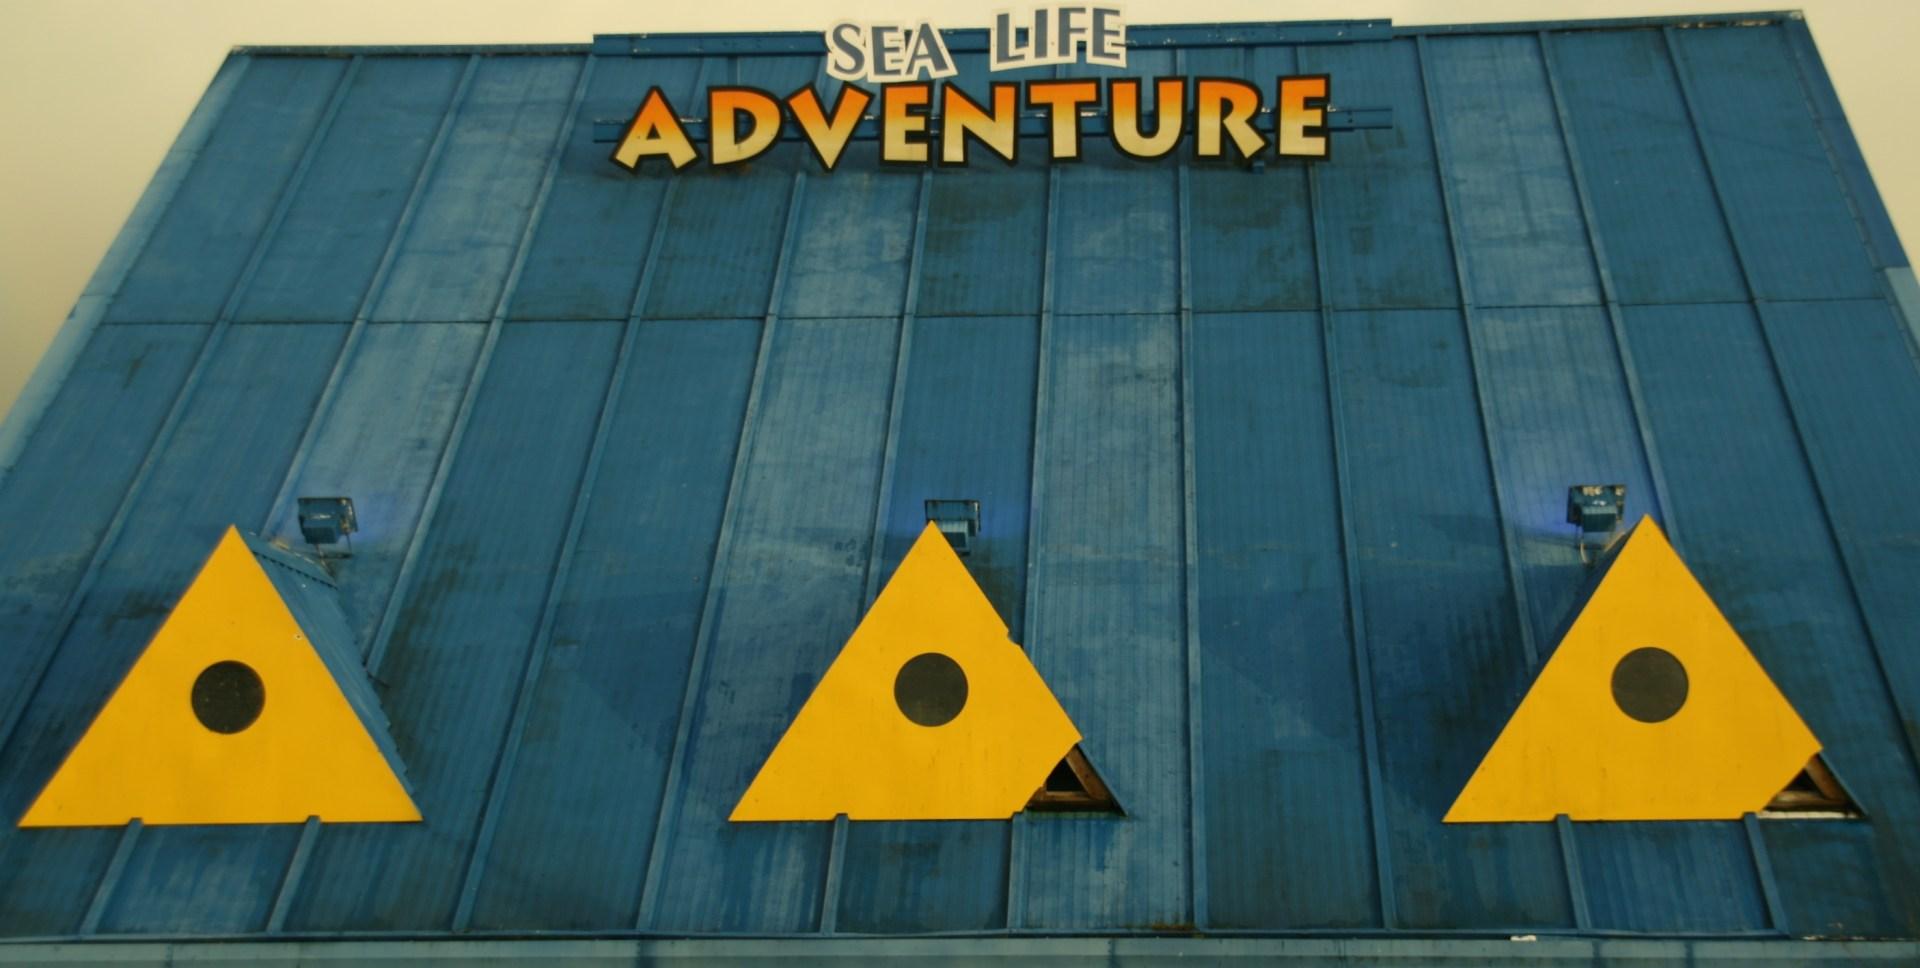 Sealife Adventure centre, Southend, Essex